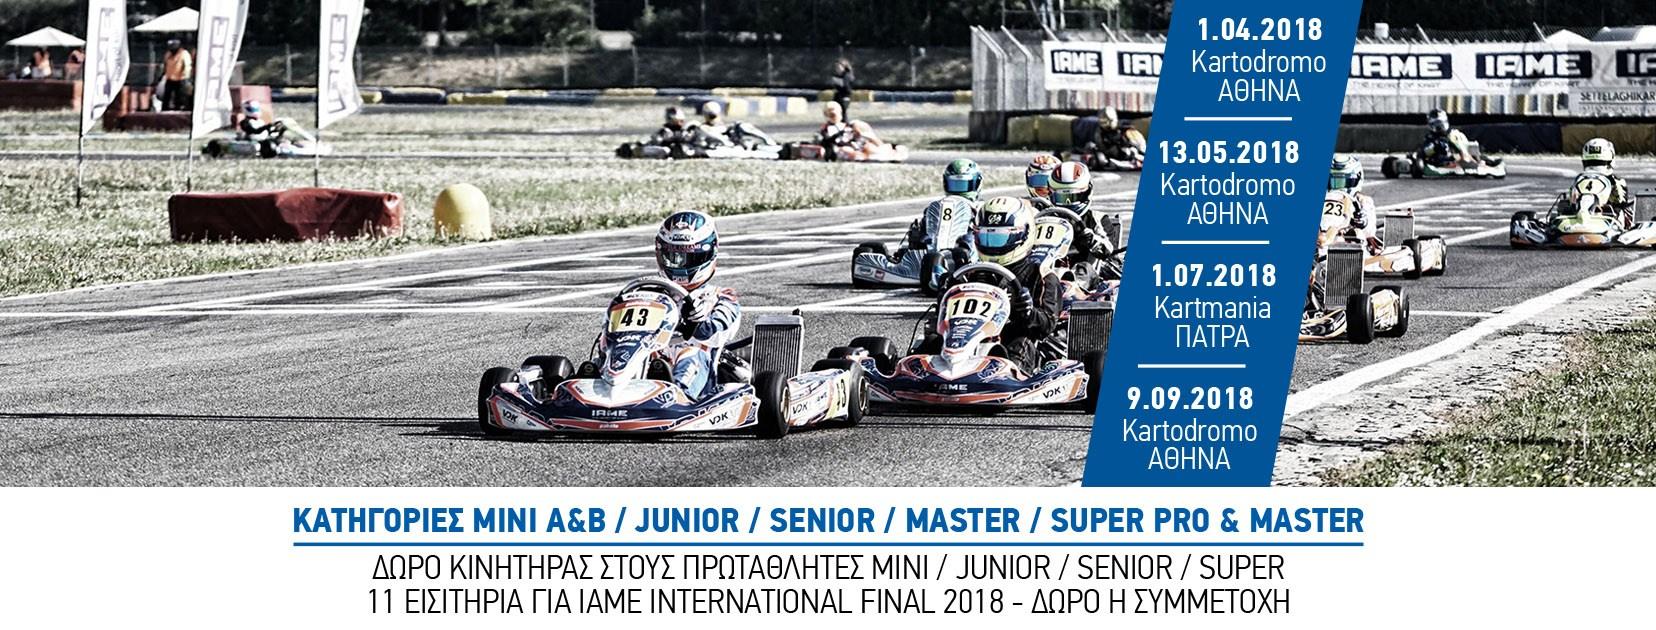 IAME Series Greece 2018: Νέα εποχή στους αγώνες Karting